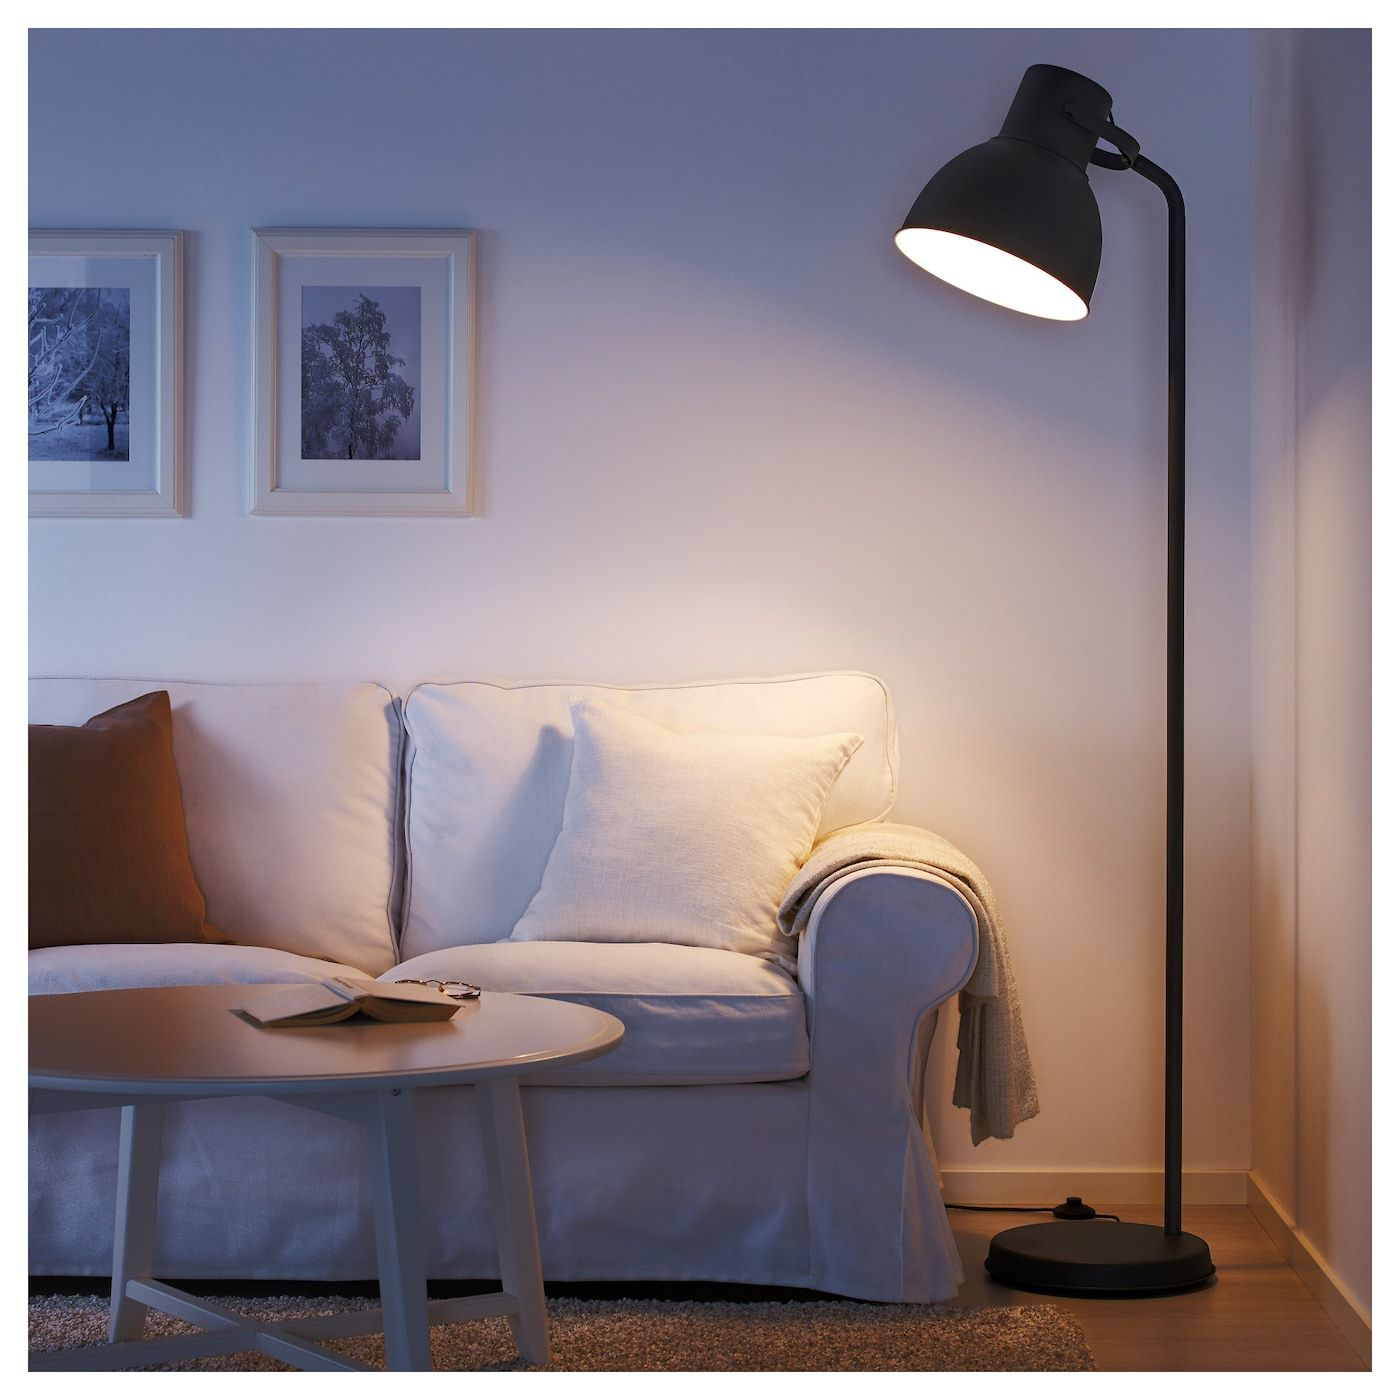 HEKTAR Standleuchte dunkelgrau | Große lampenschirme